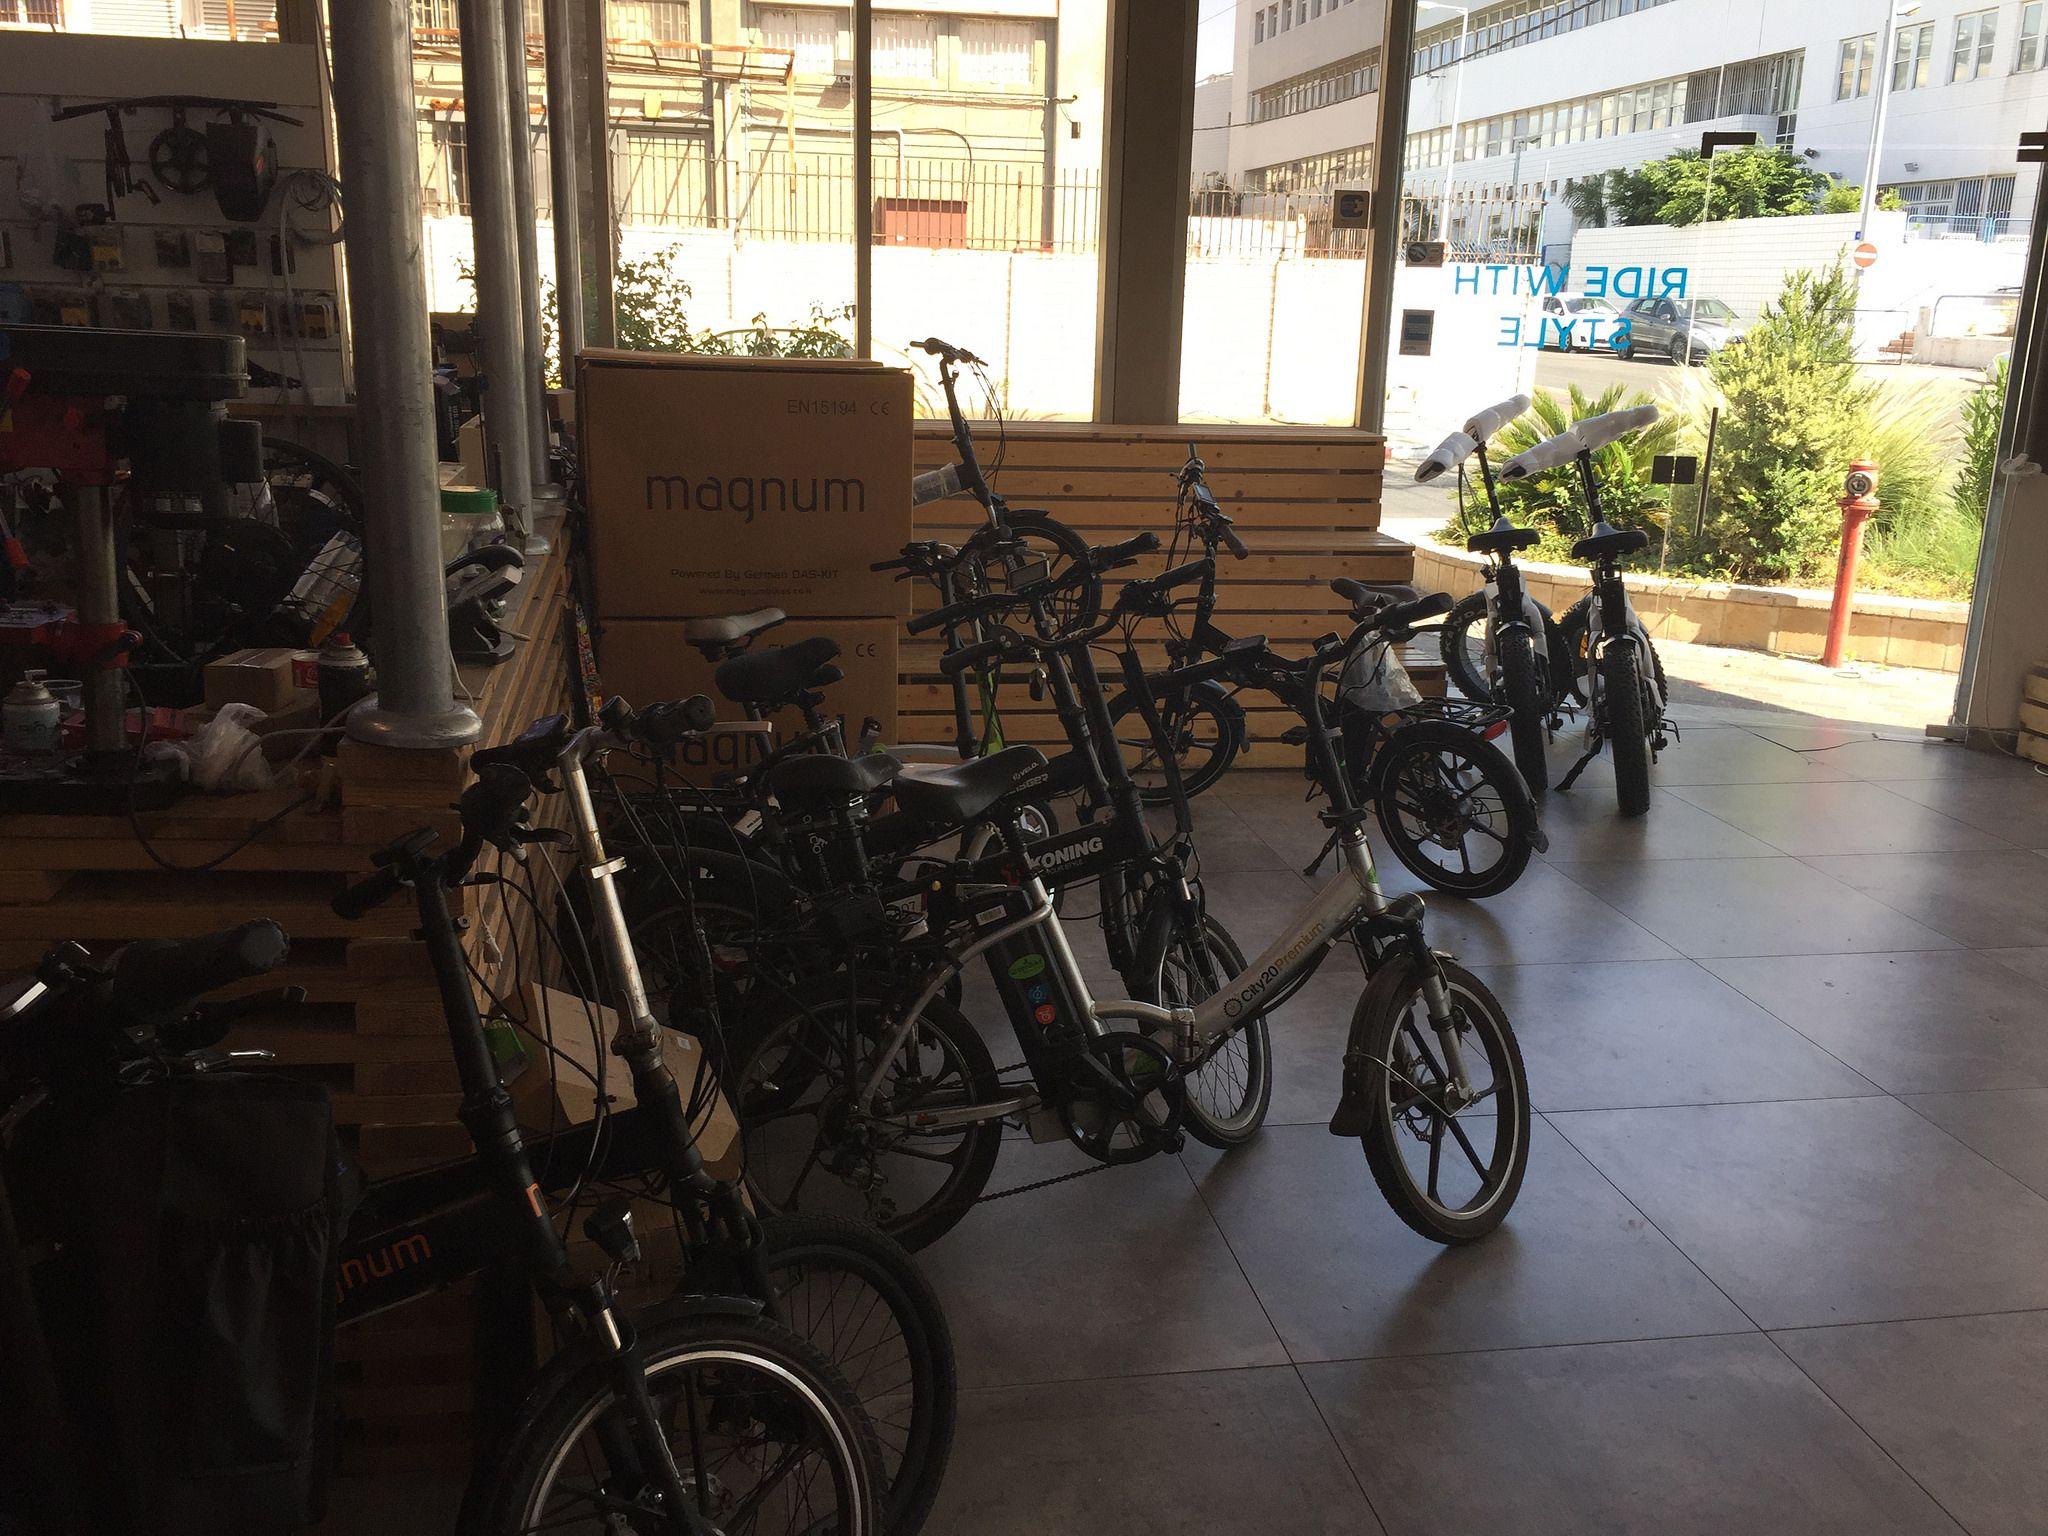 https://flic.kr/s/aHskXwzj5r | אופניים חשמליות דגם דארק נייט ברשת אורבניקו |  אופניים חשמליות  - מותגי אורבניק במבצעים. ועכשיו דגם דארק נייט בעיצוב חדש, היכנסו לראות. מבחר דגמים בעלי תו תקן ישראלי ואירופאי. urbanico.co.il/החנות-שלנו